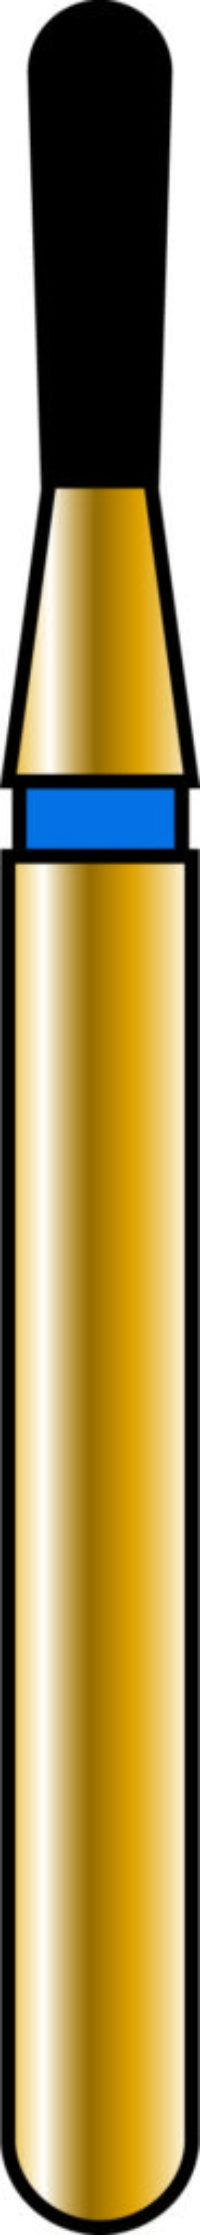 Pear 12-4mm Gold Diamond Bur